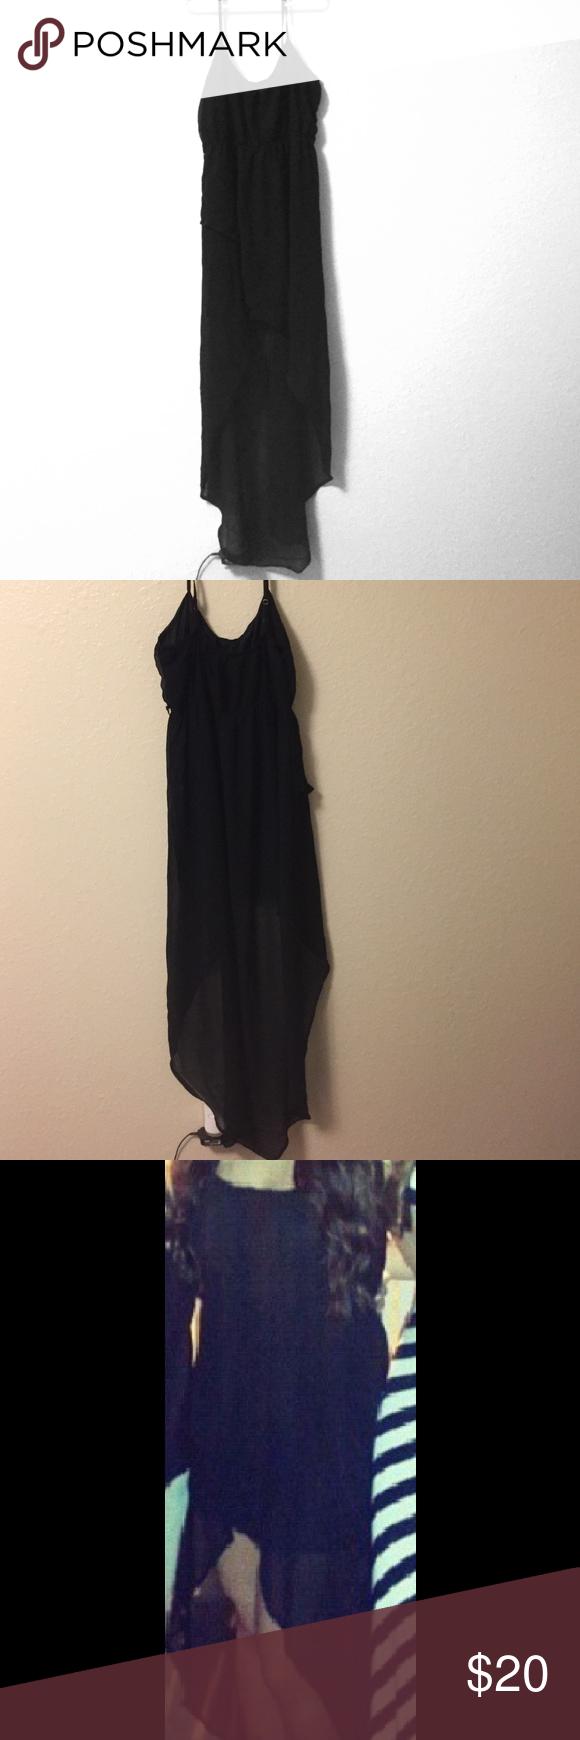 High low dress All black high low dress Dresses High Low